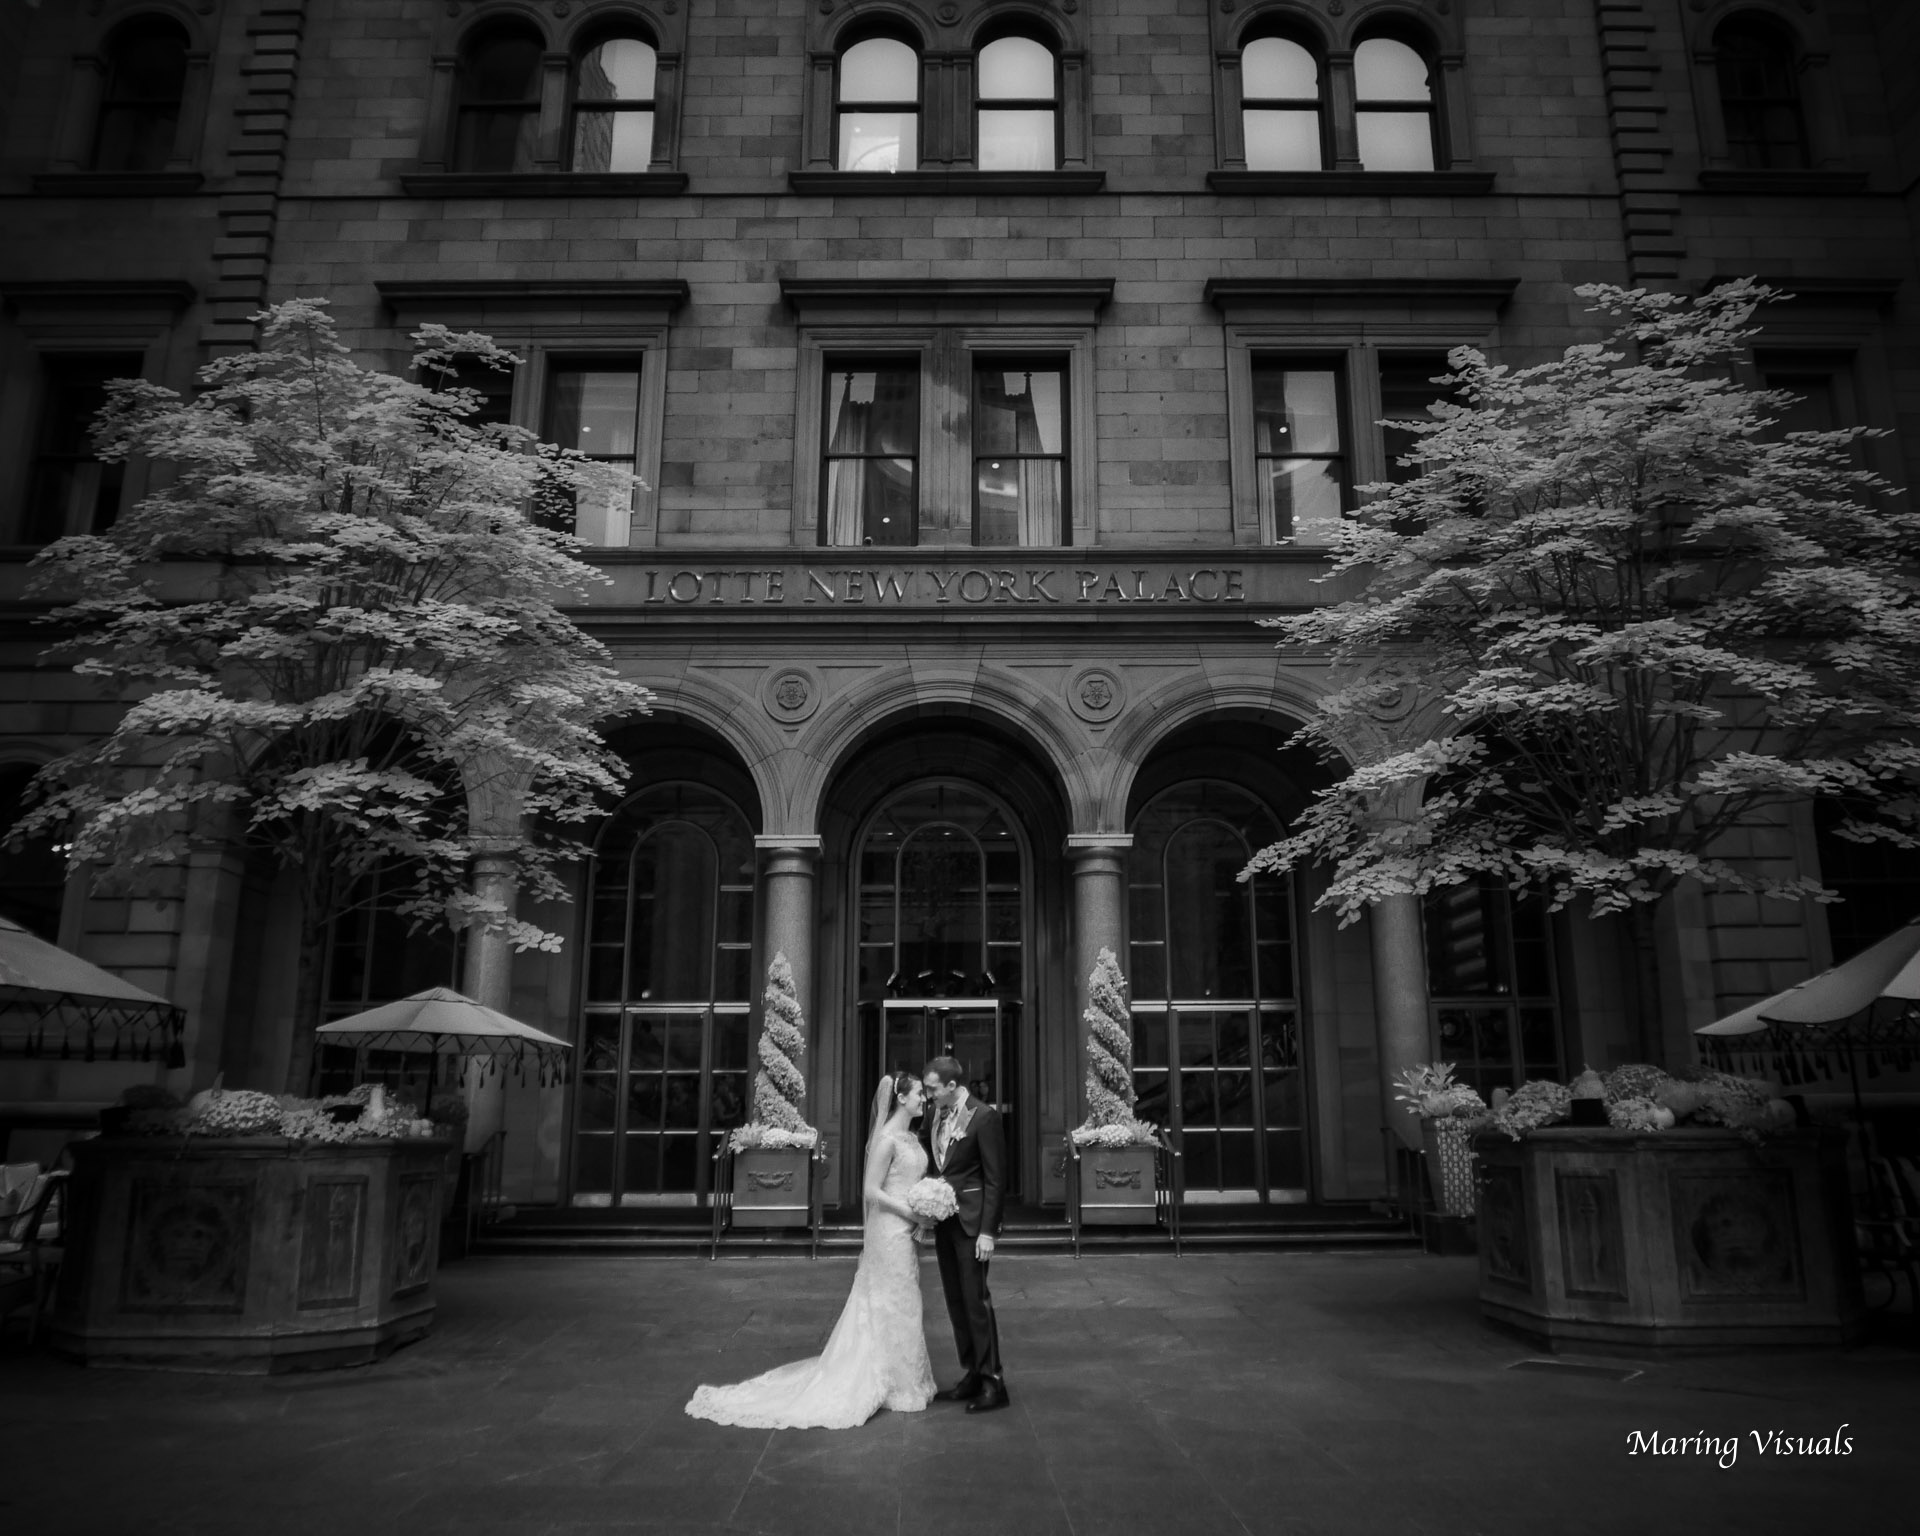 Lotte New York Palace Wedding 00190.jpg